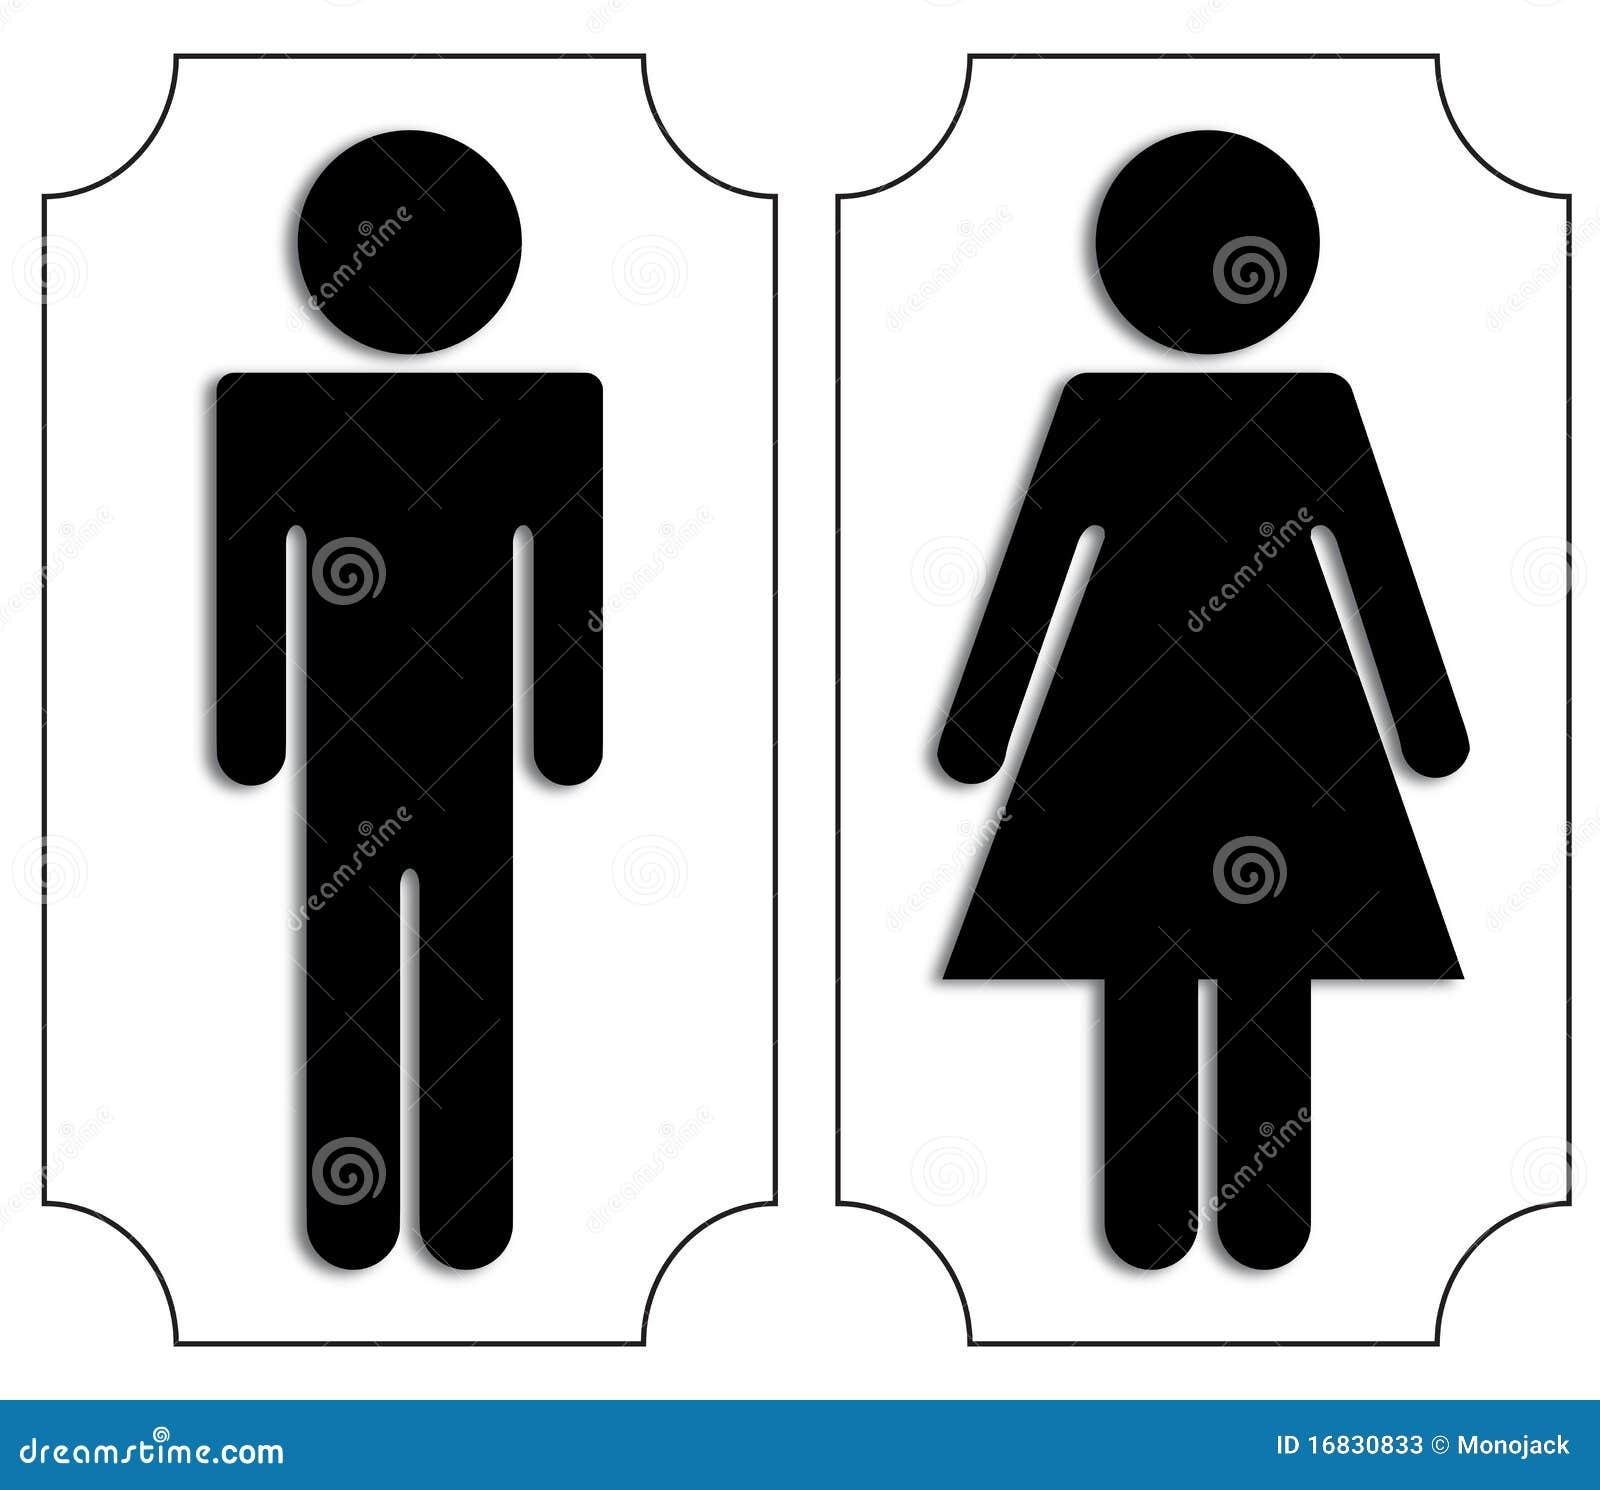 Toilet Signs Stock Photos - Image: 16830833